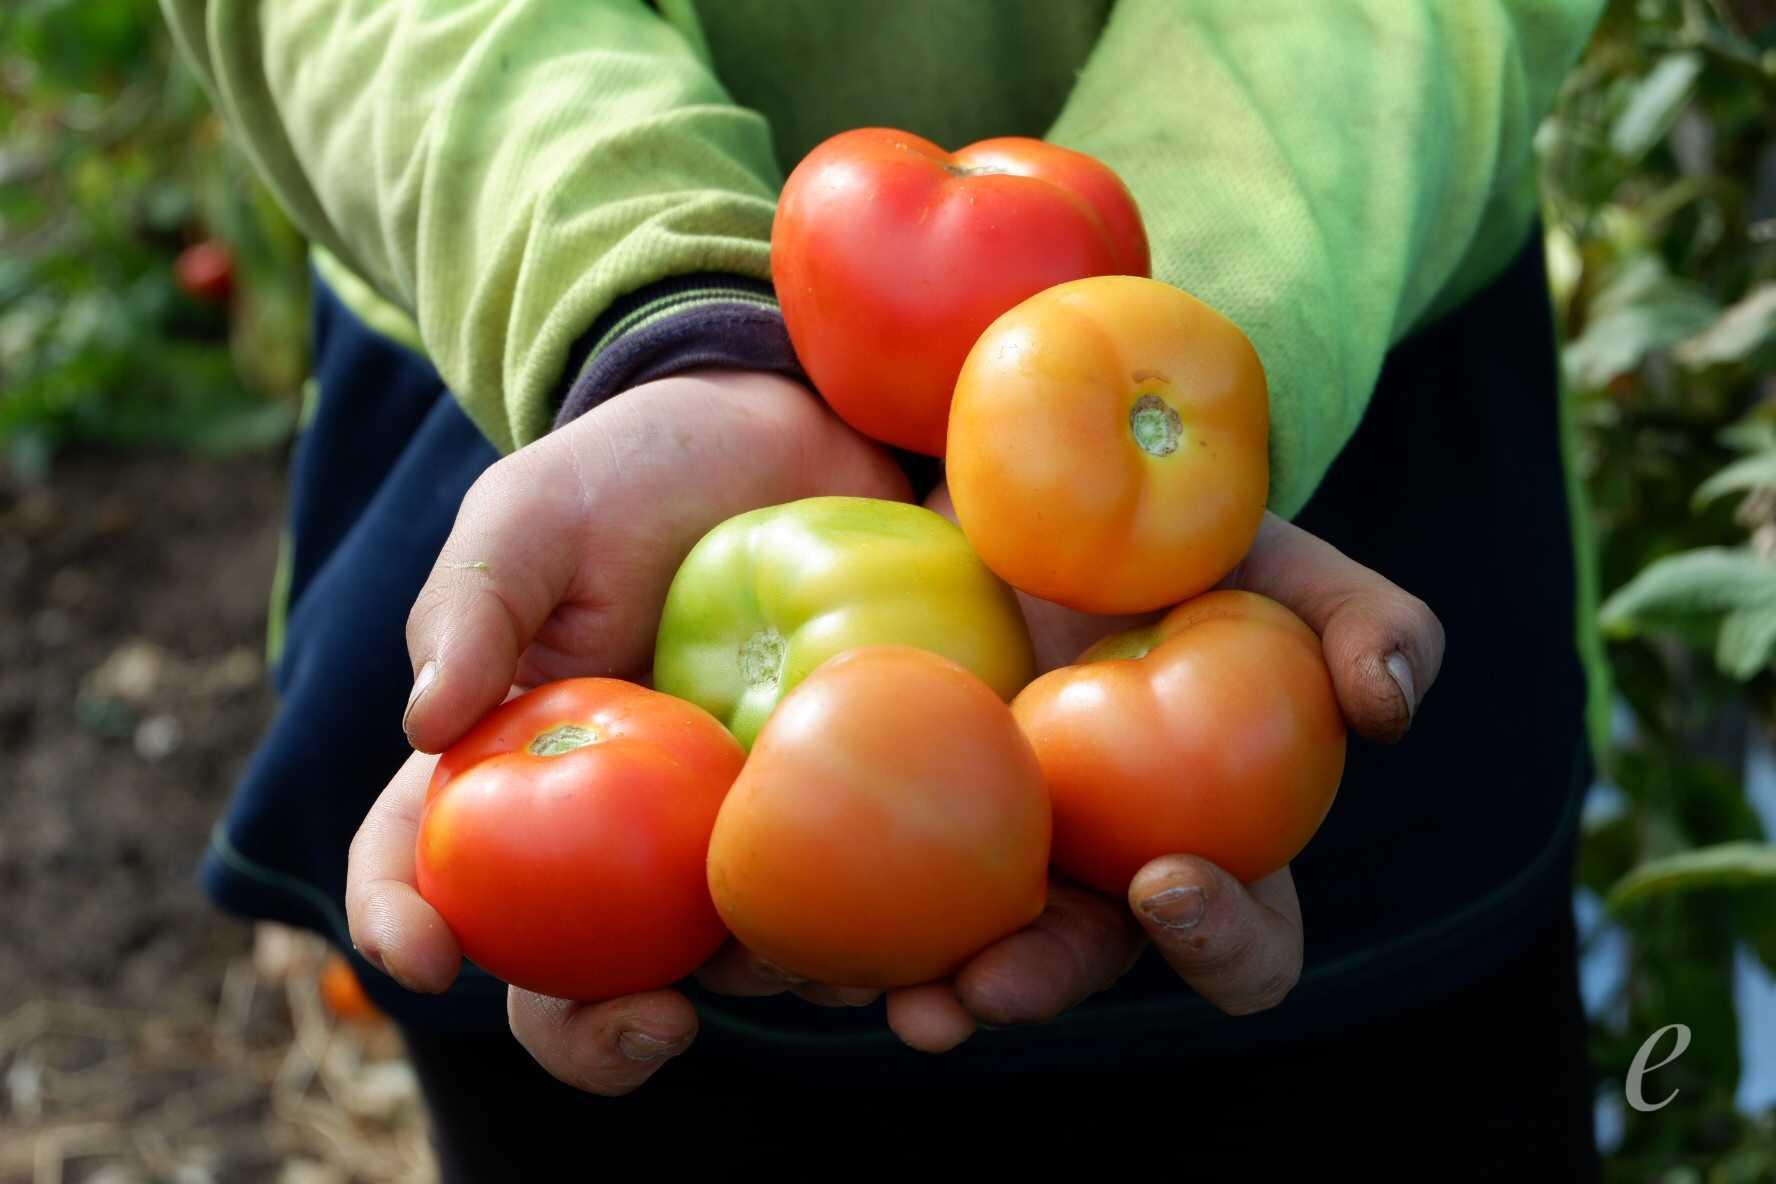 Benarkah Pemetik Tomat Digaji 60 Juta Ini Pengalaman Saya Oleh